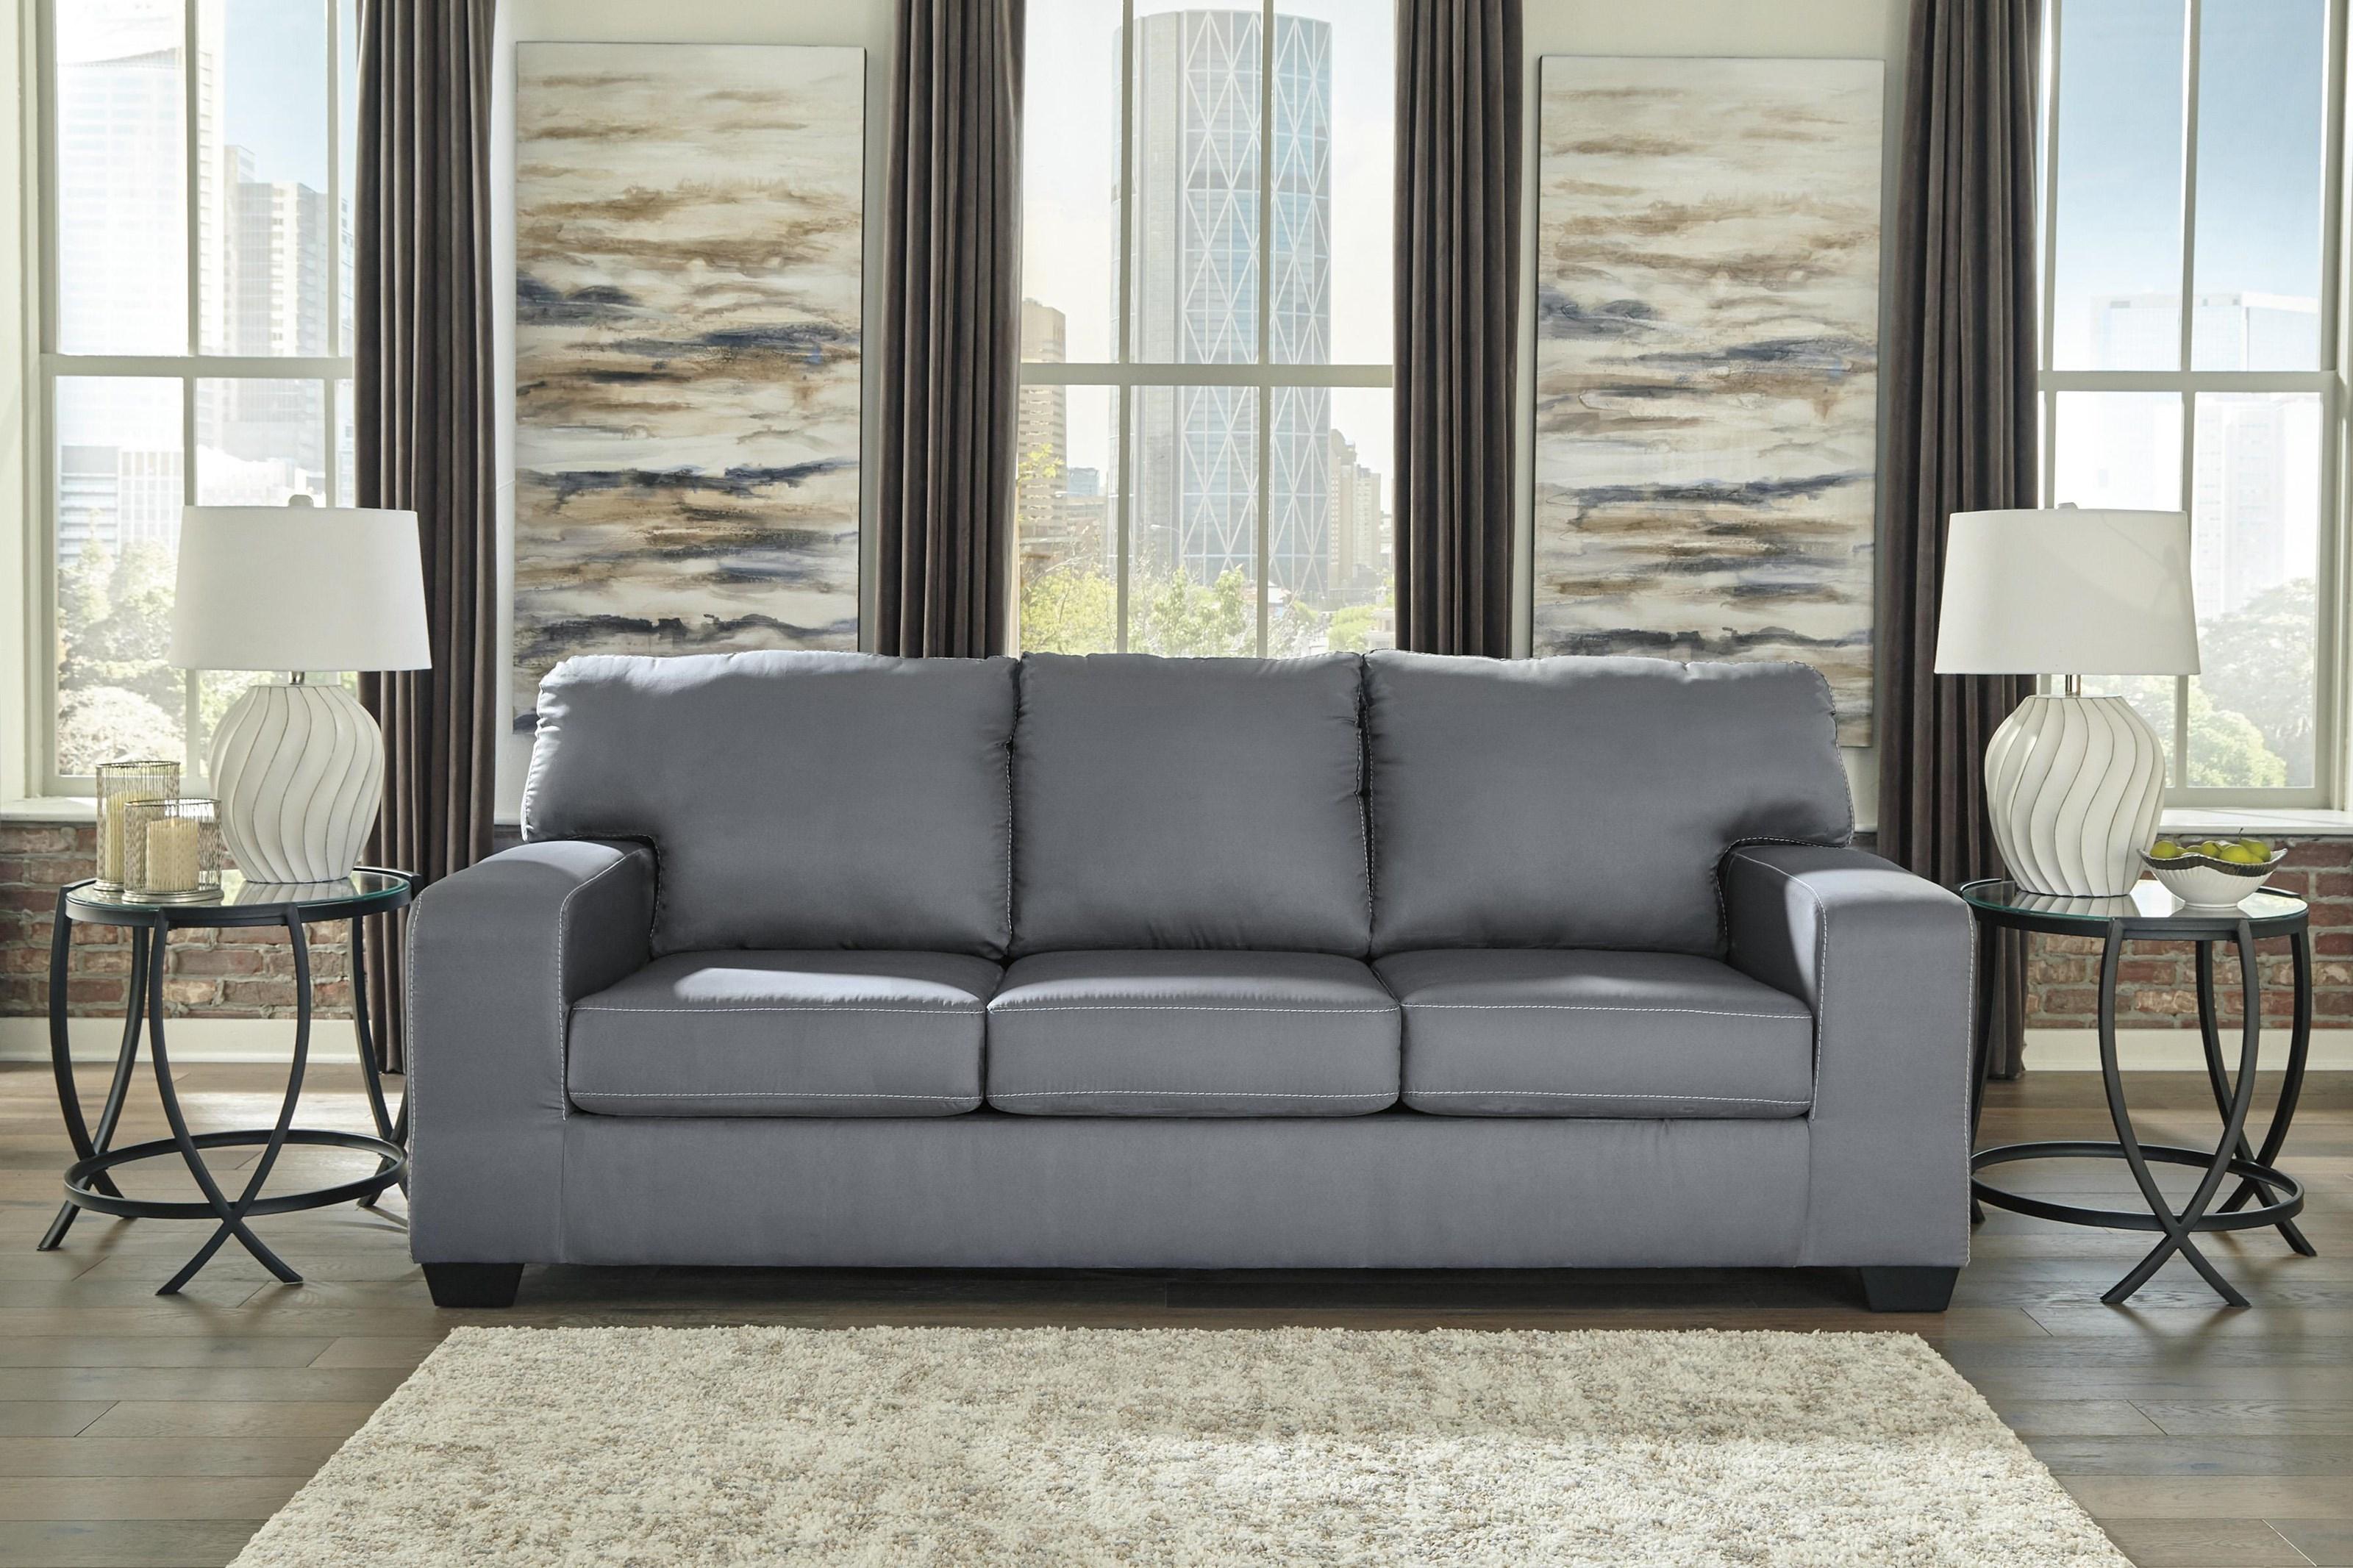 Ashley Furniture Kanosh 4990339 Contemporary Sofa Sleeper Sam Levitz Furniture Sleeper Sofas